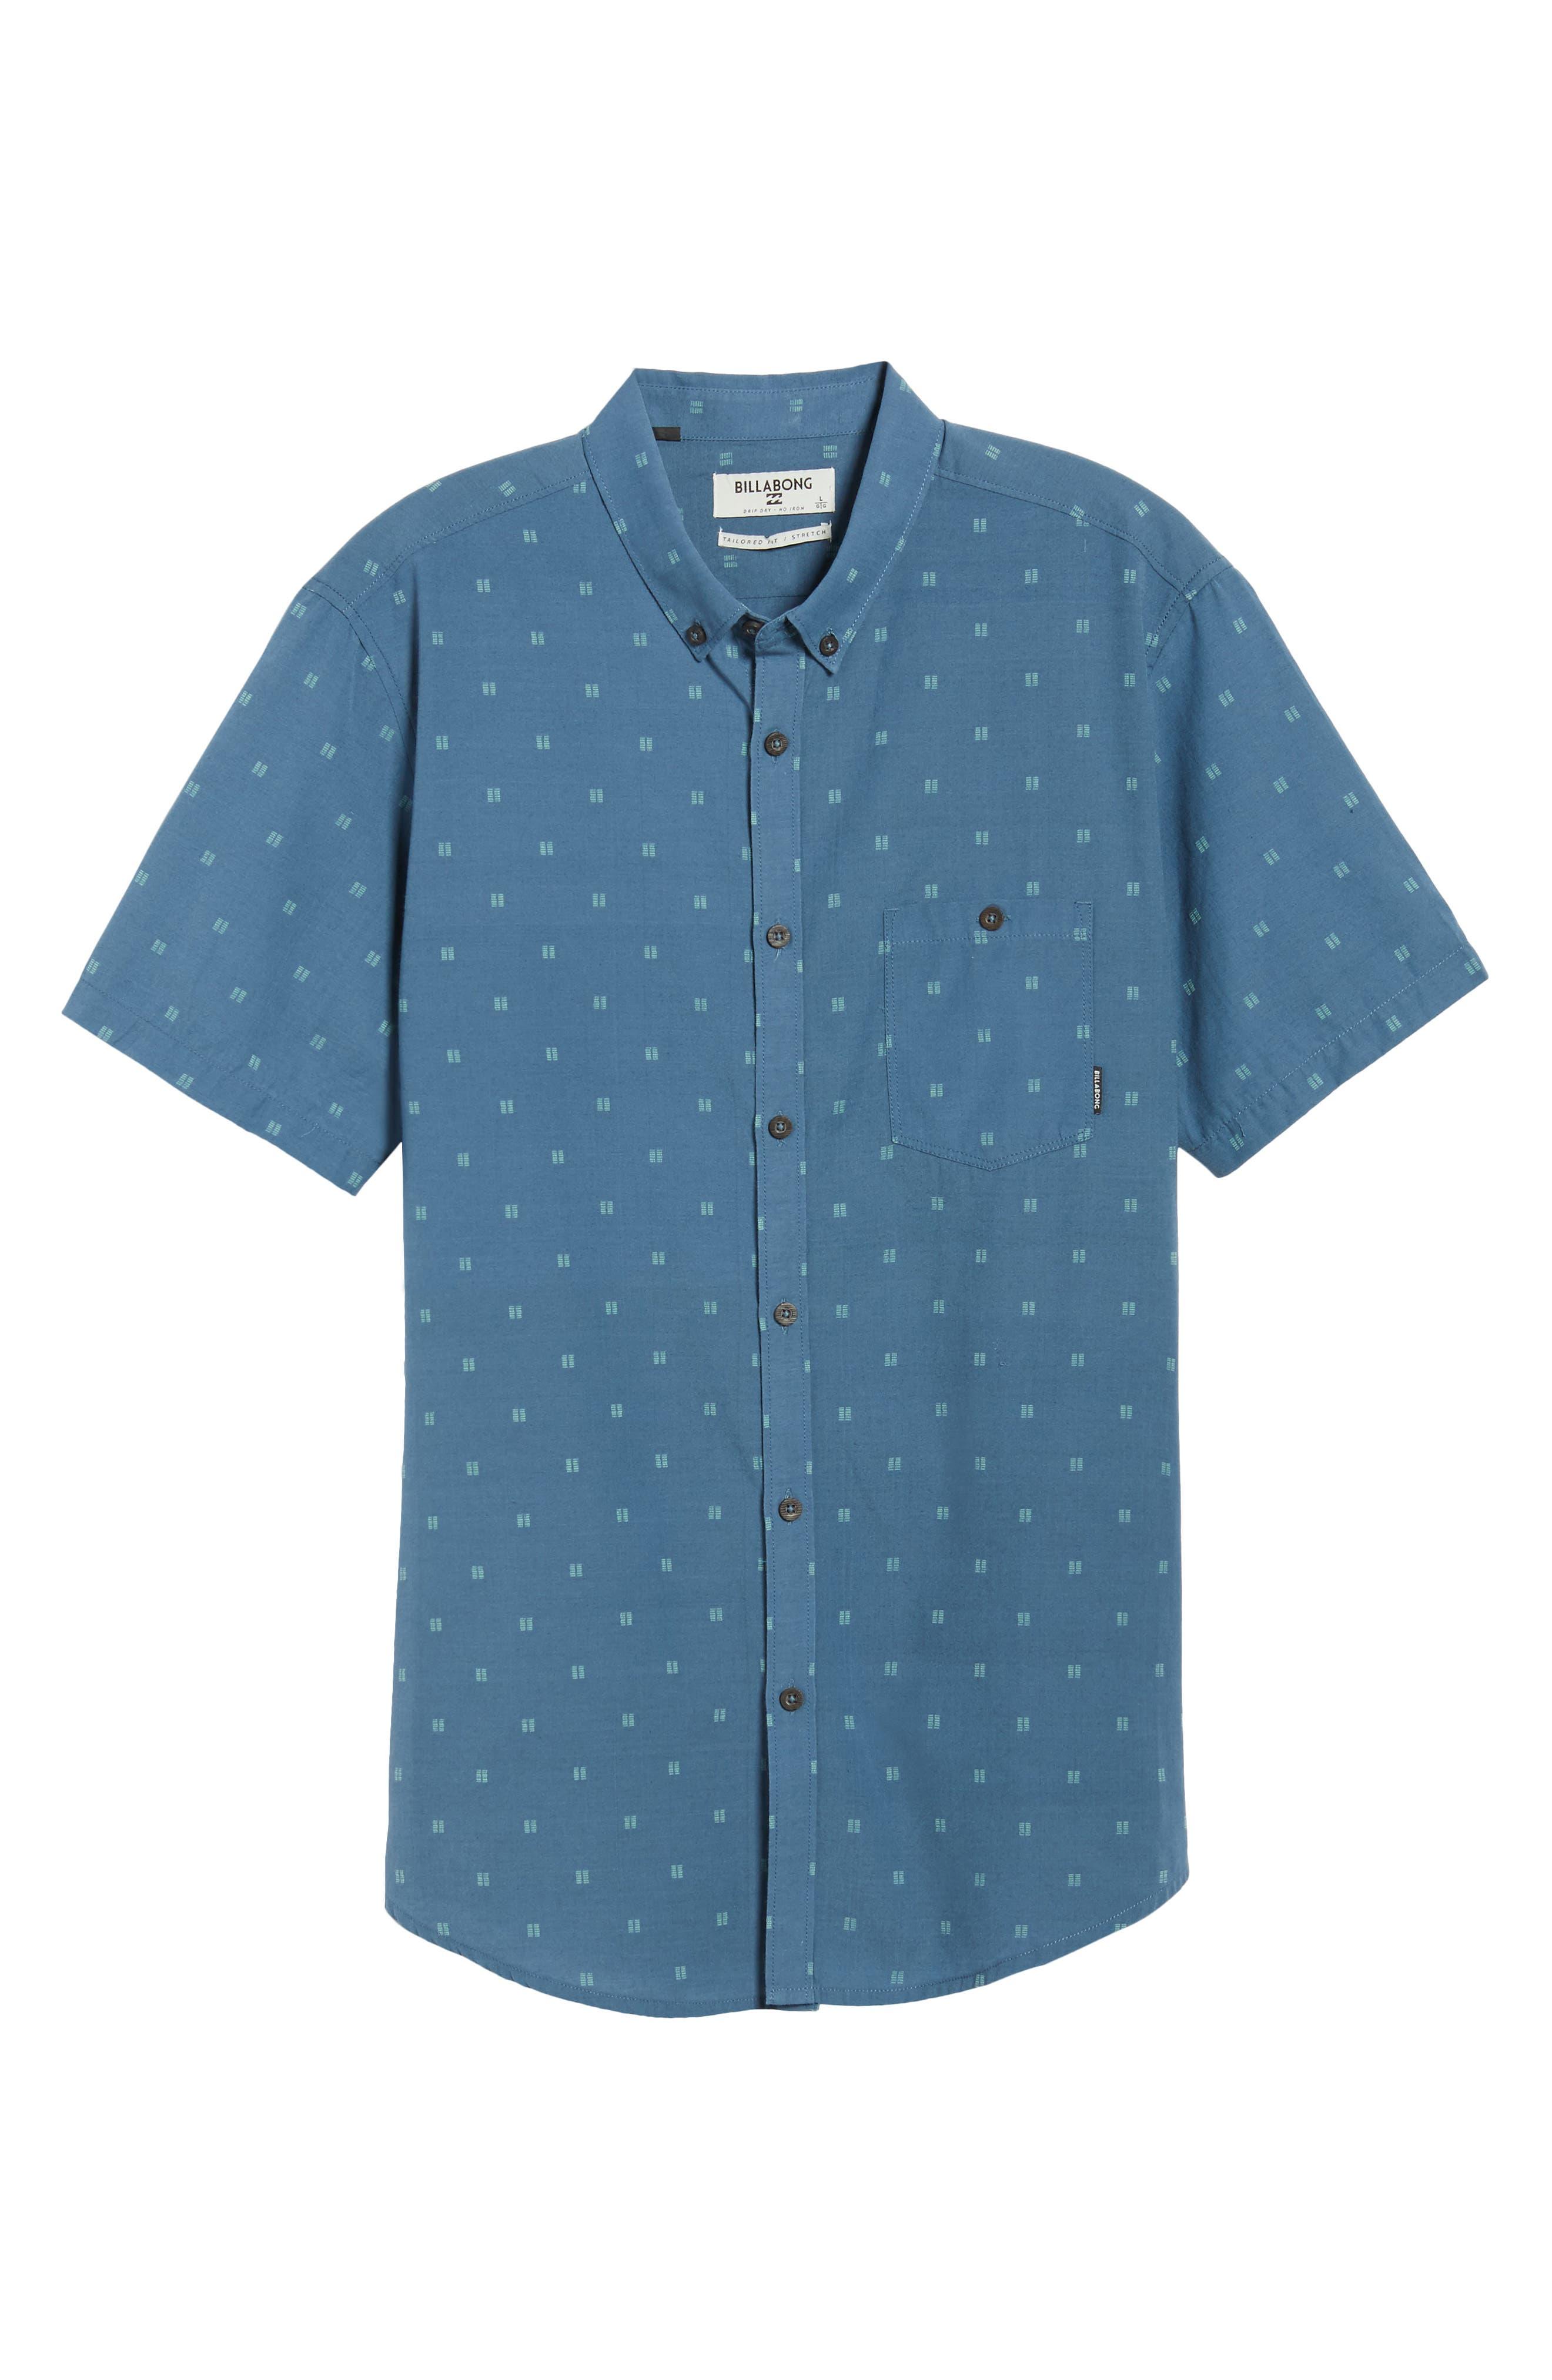 All Day Jacquard Shirt,                             Alternate thumbnail 6, color,                             Deep Blue